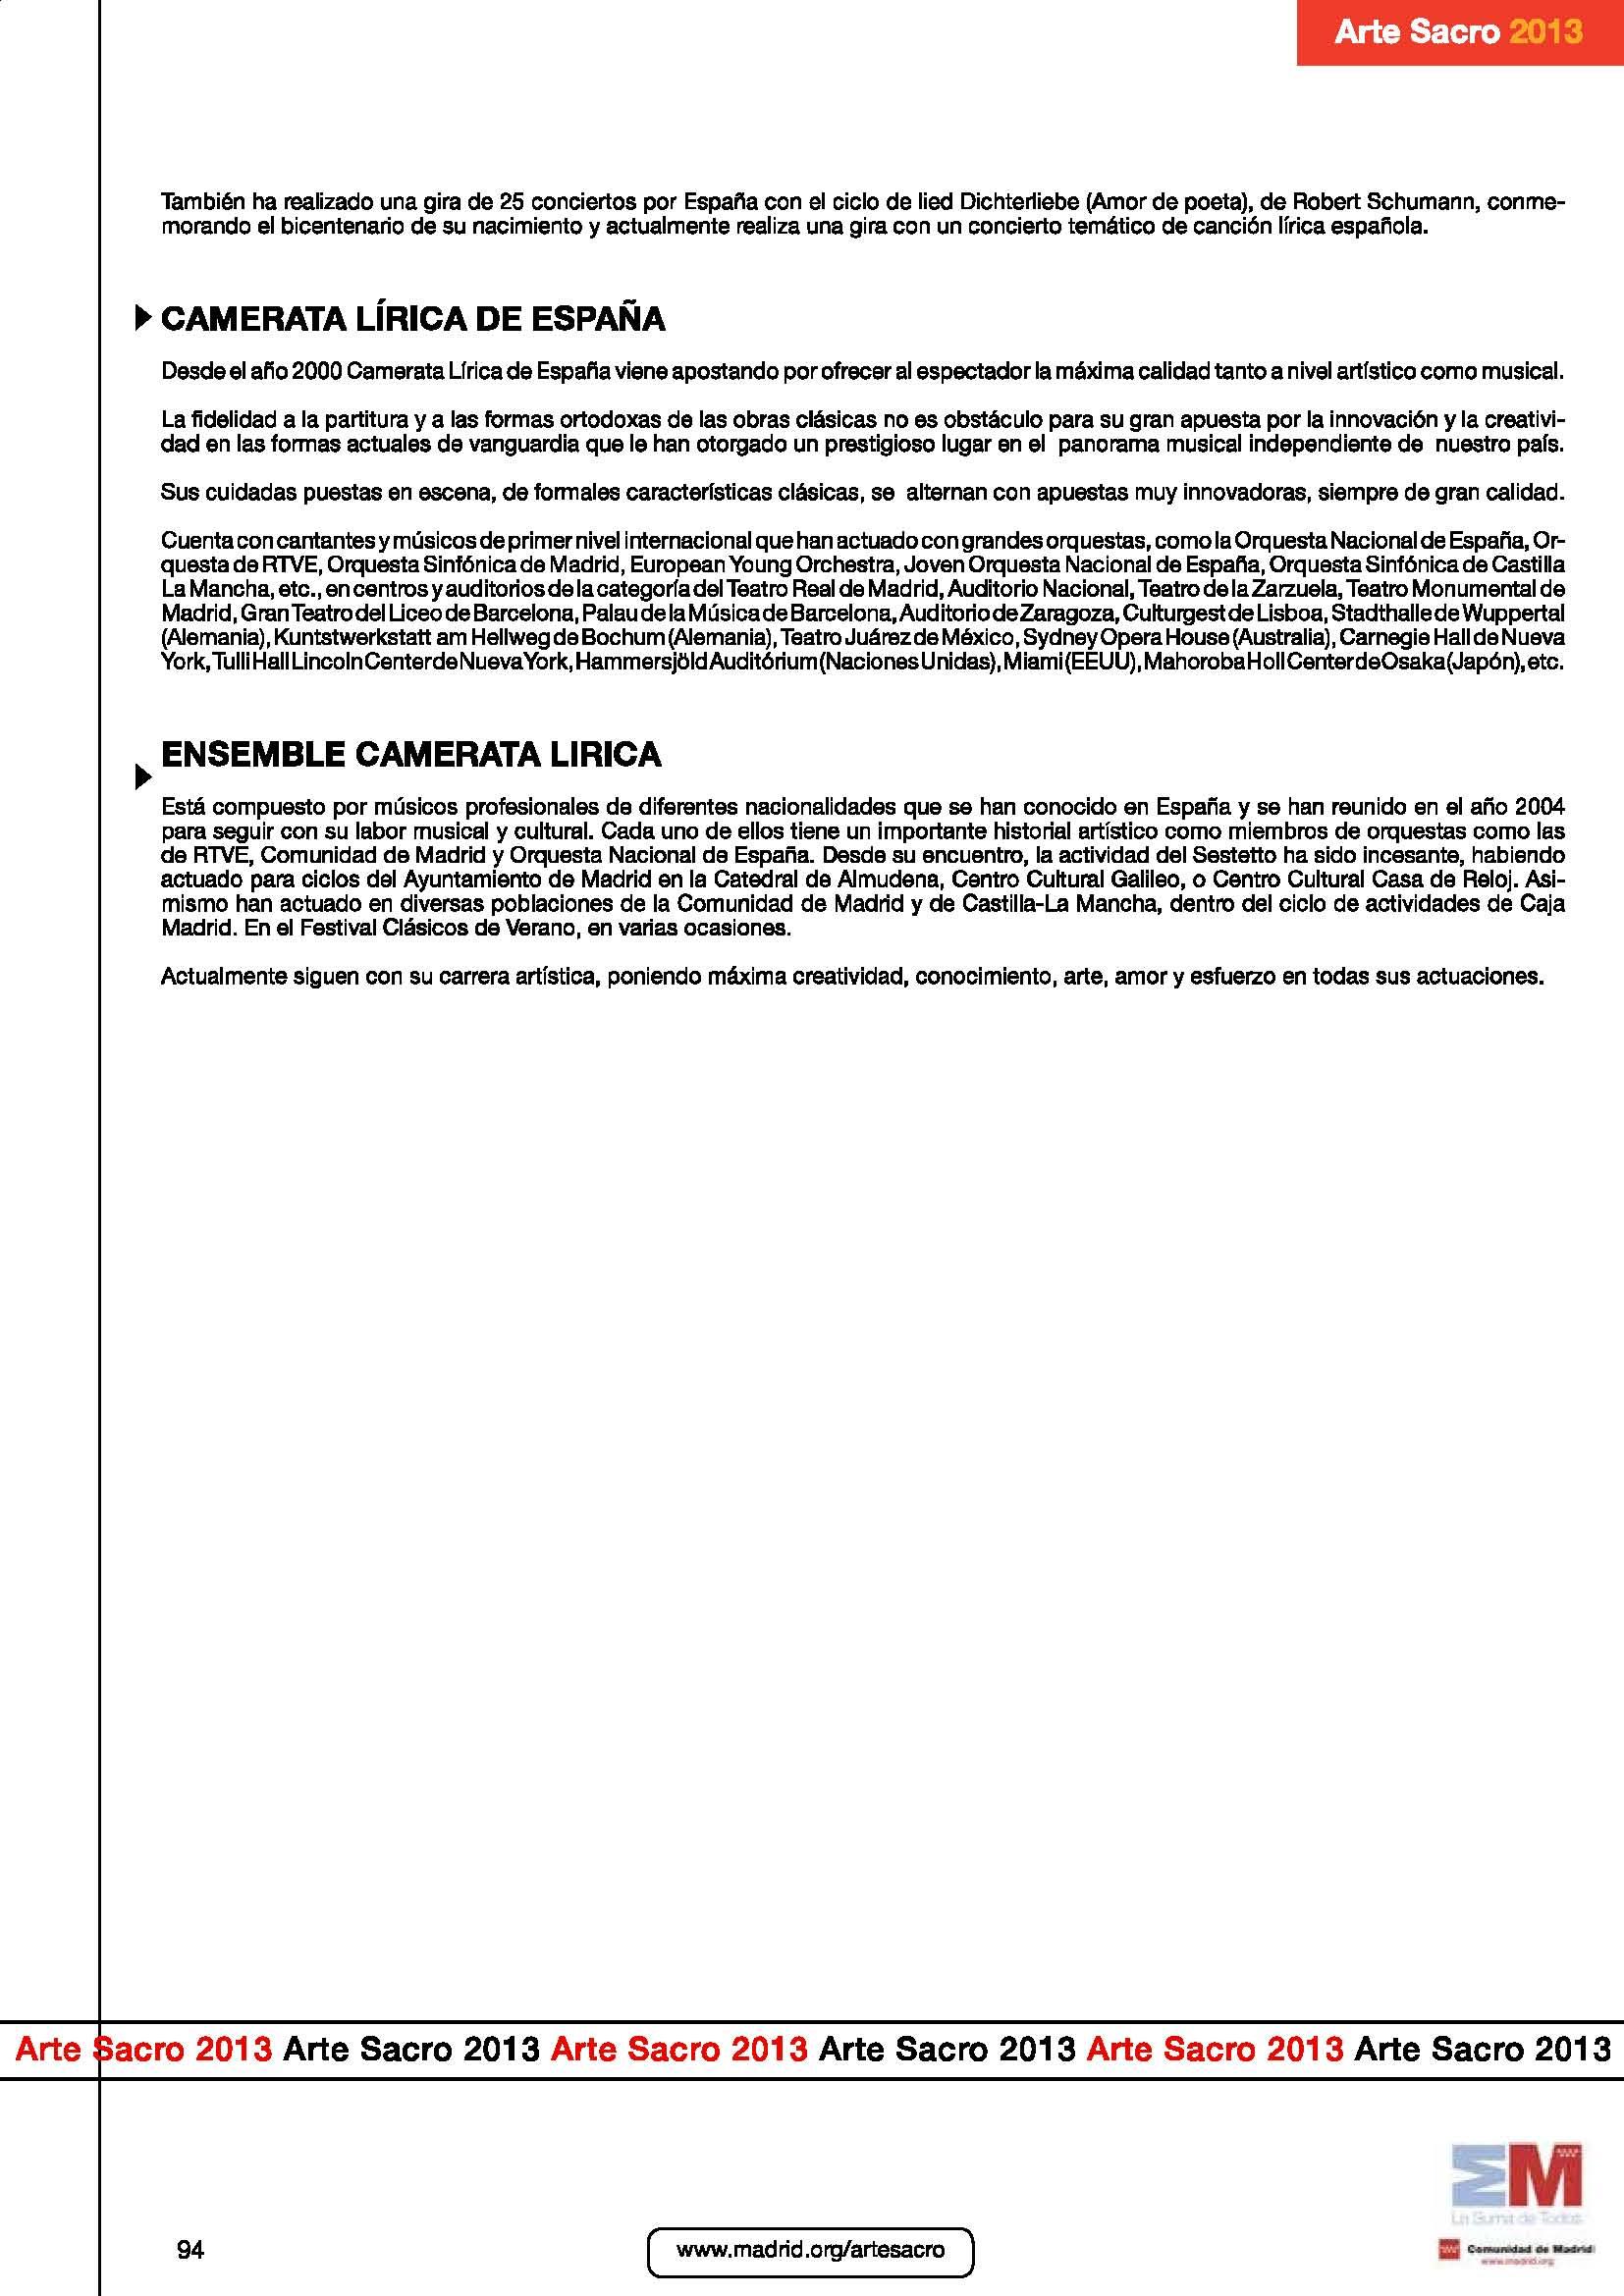 dossier_completo_Página_094